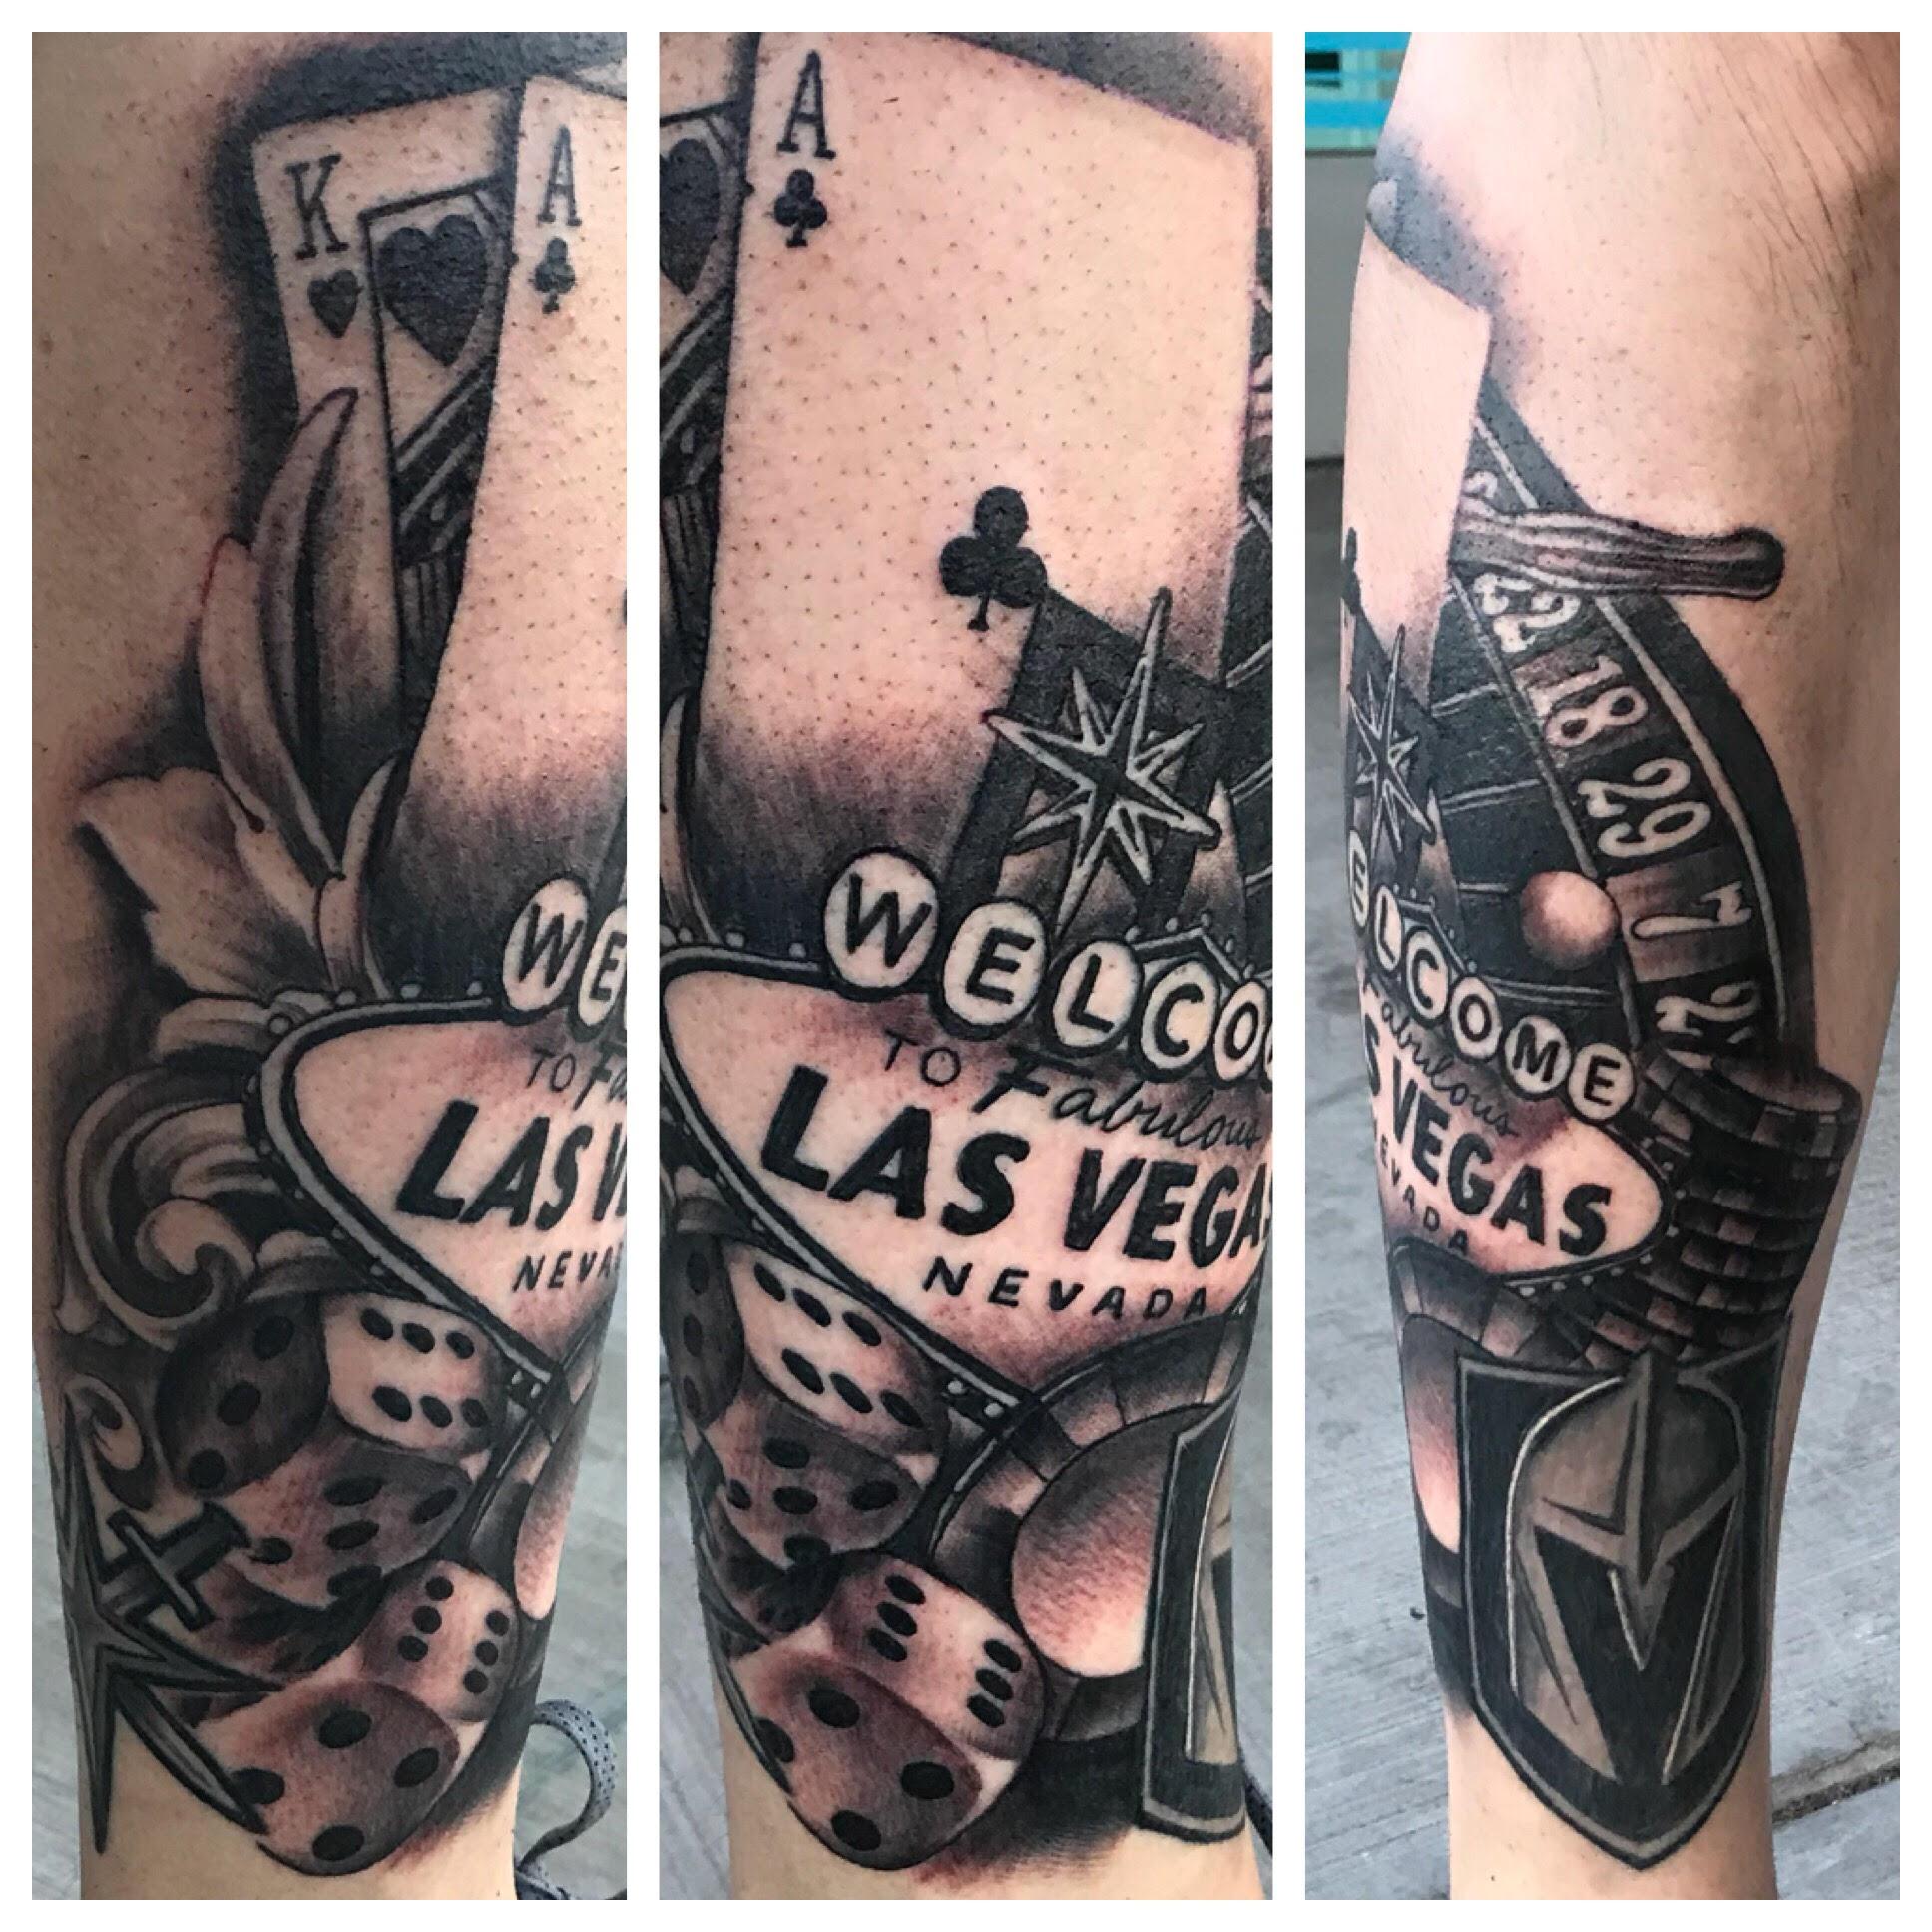 Las Vegas Tattoo by Krystof